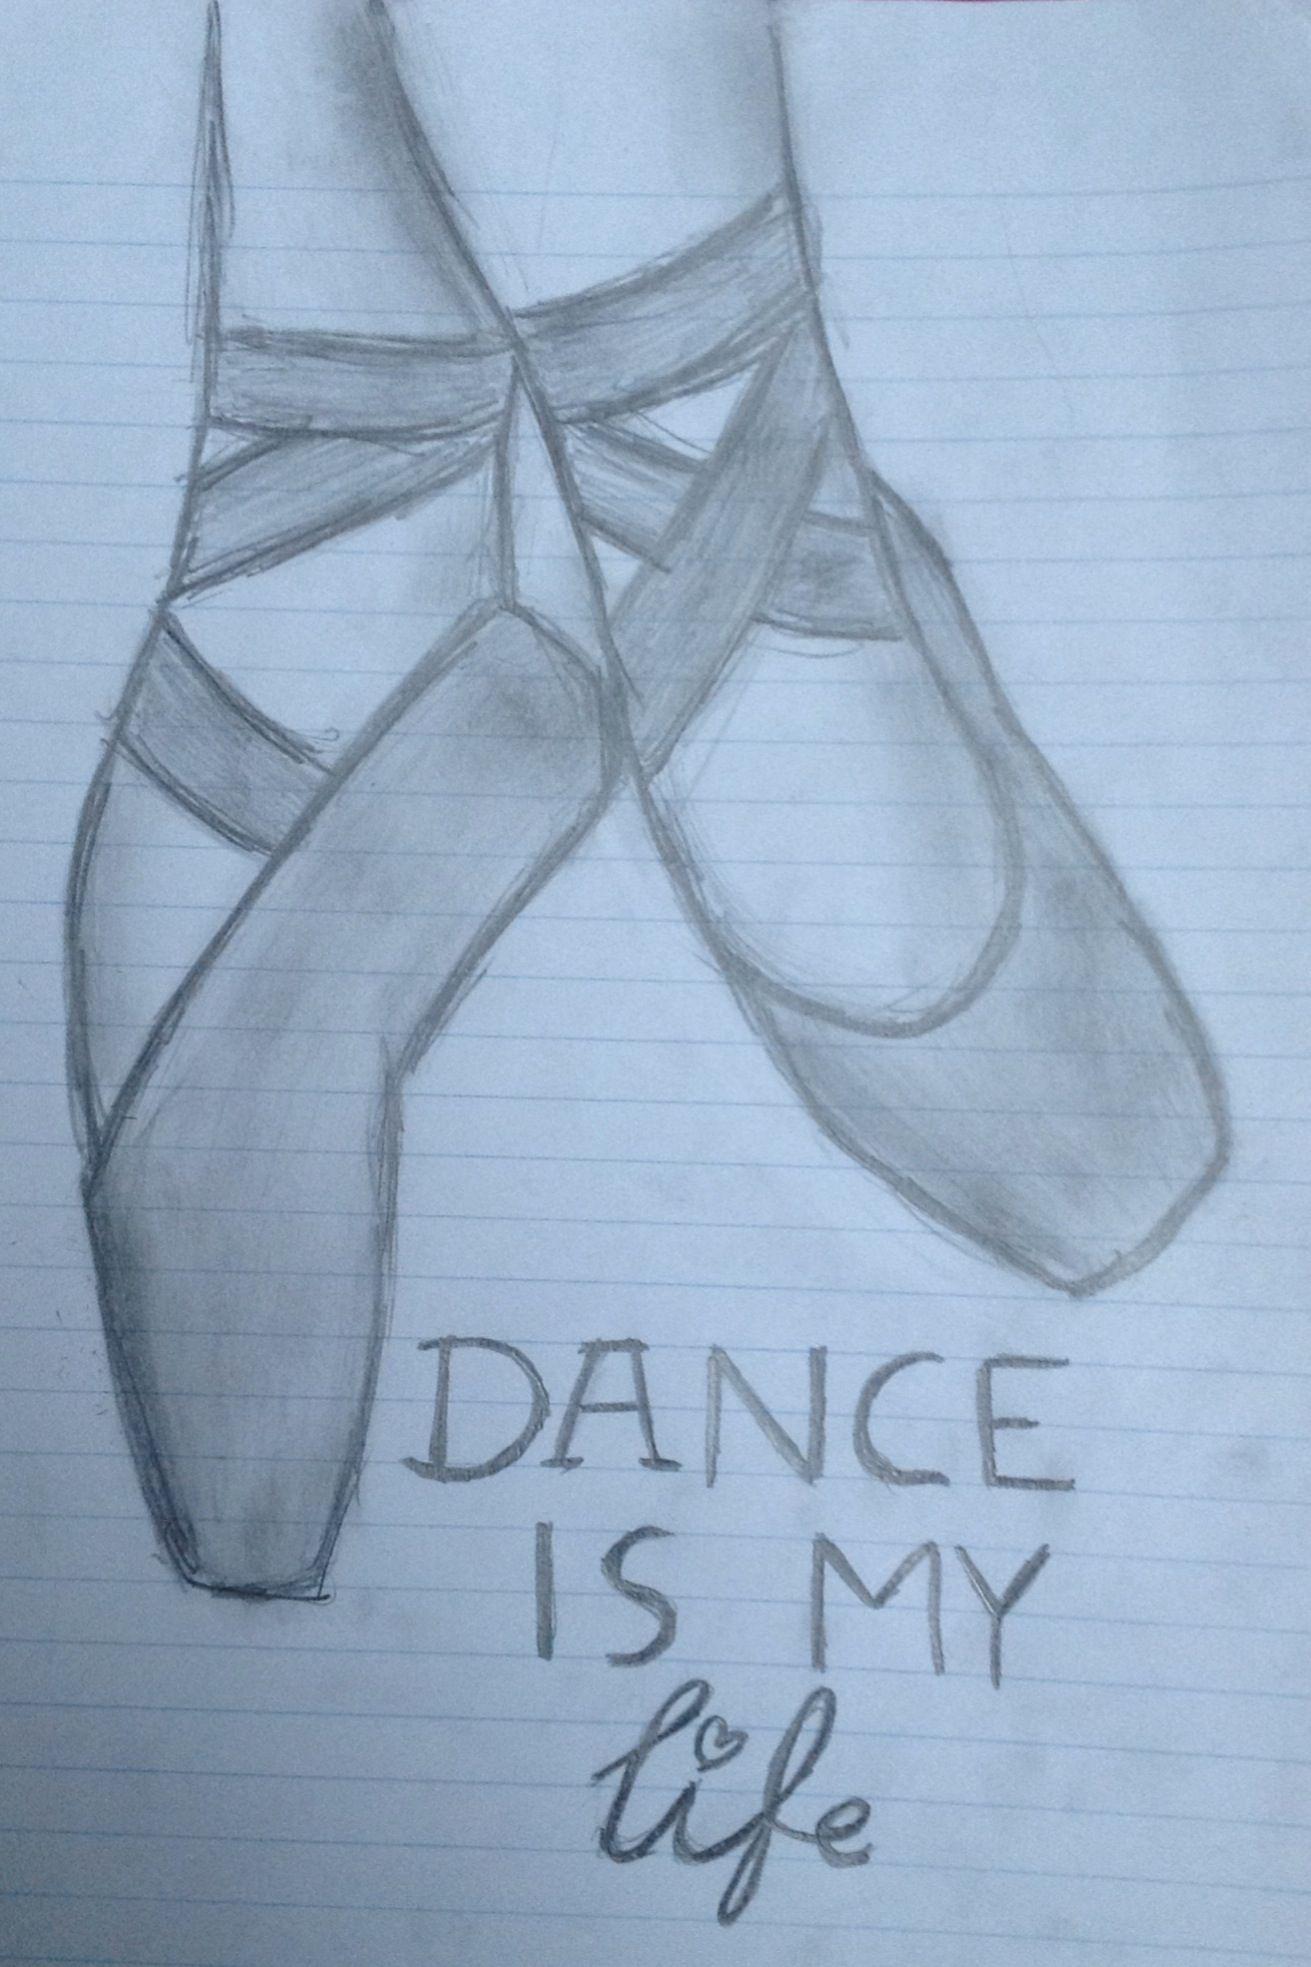 I dont dance becasue I have too.... I dance becasue I NEED